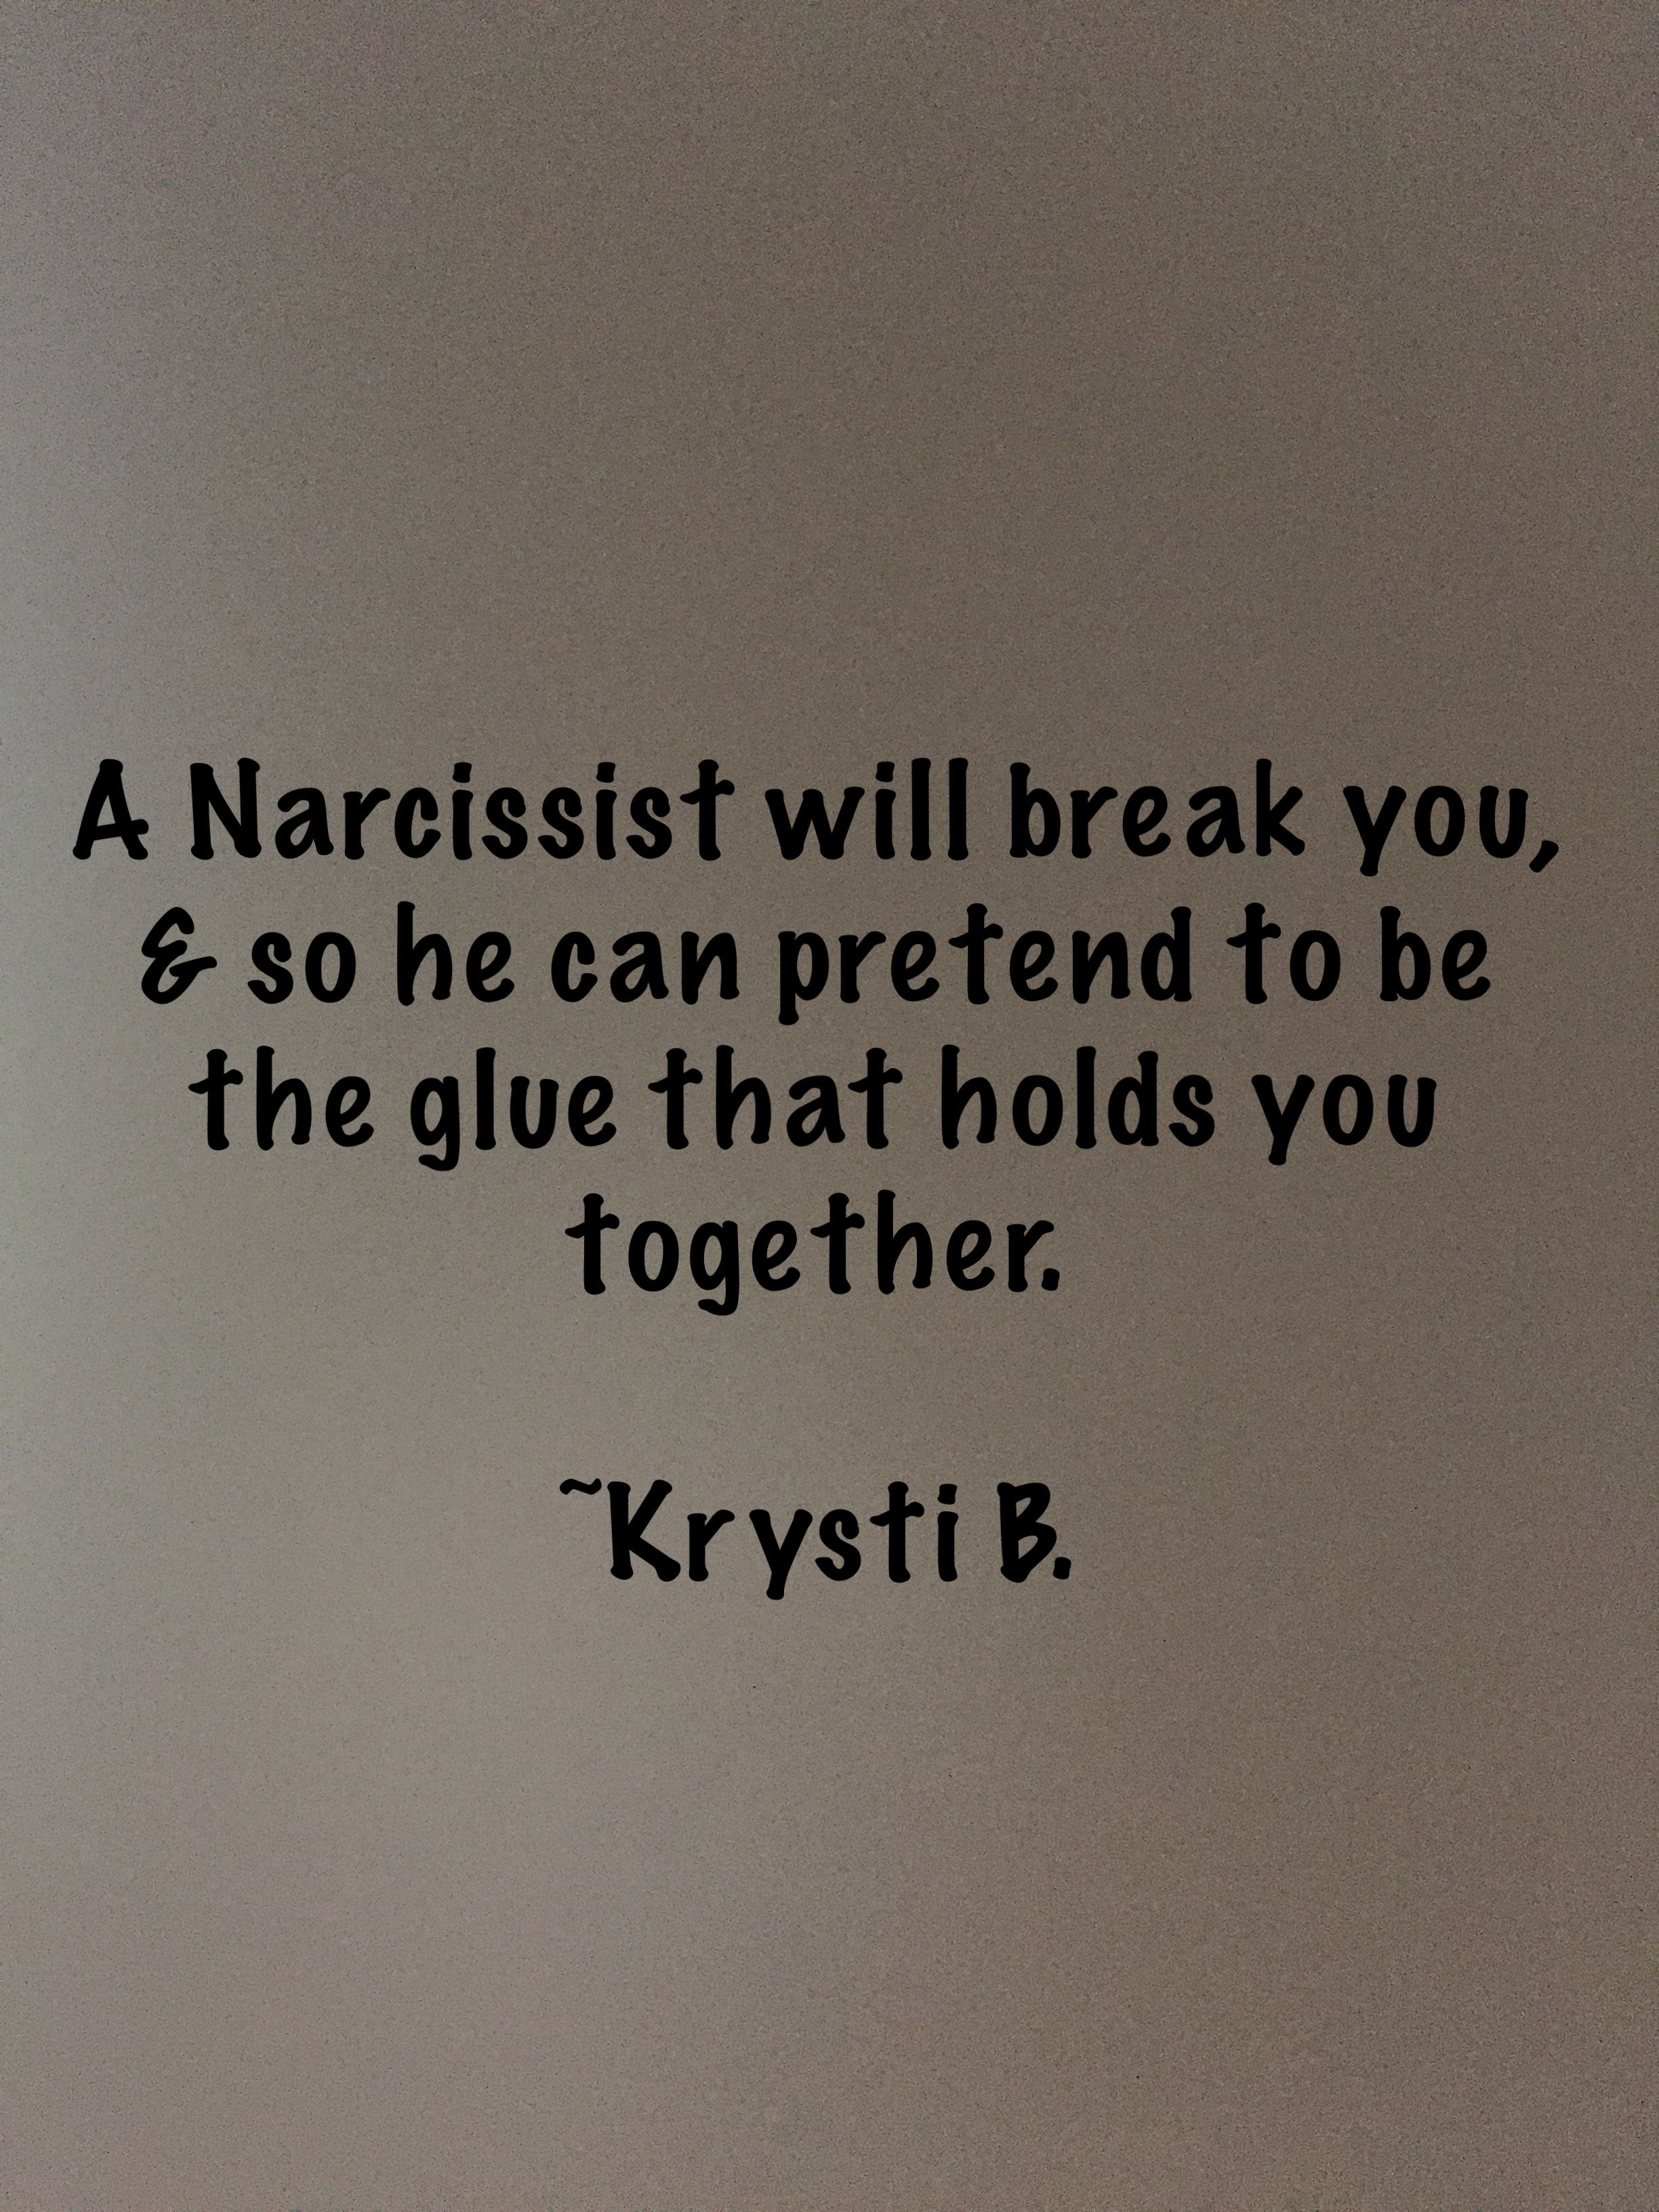 Former relationship, glue or break 37